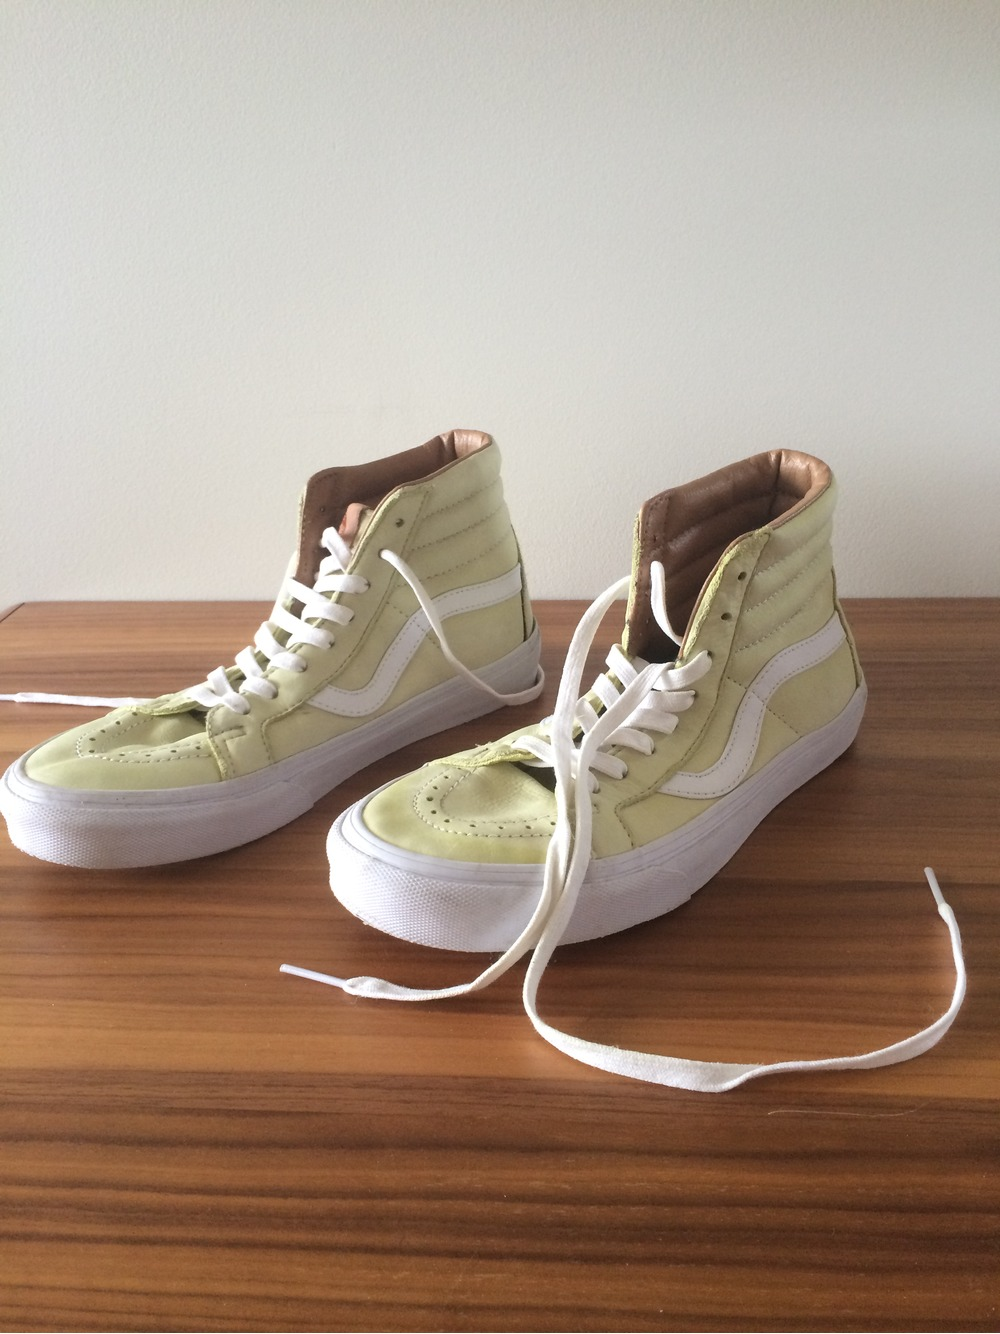 vans california sk8-hi butter soft reissue sneaker  a9bd8bcbe9